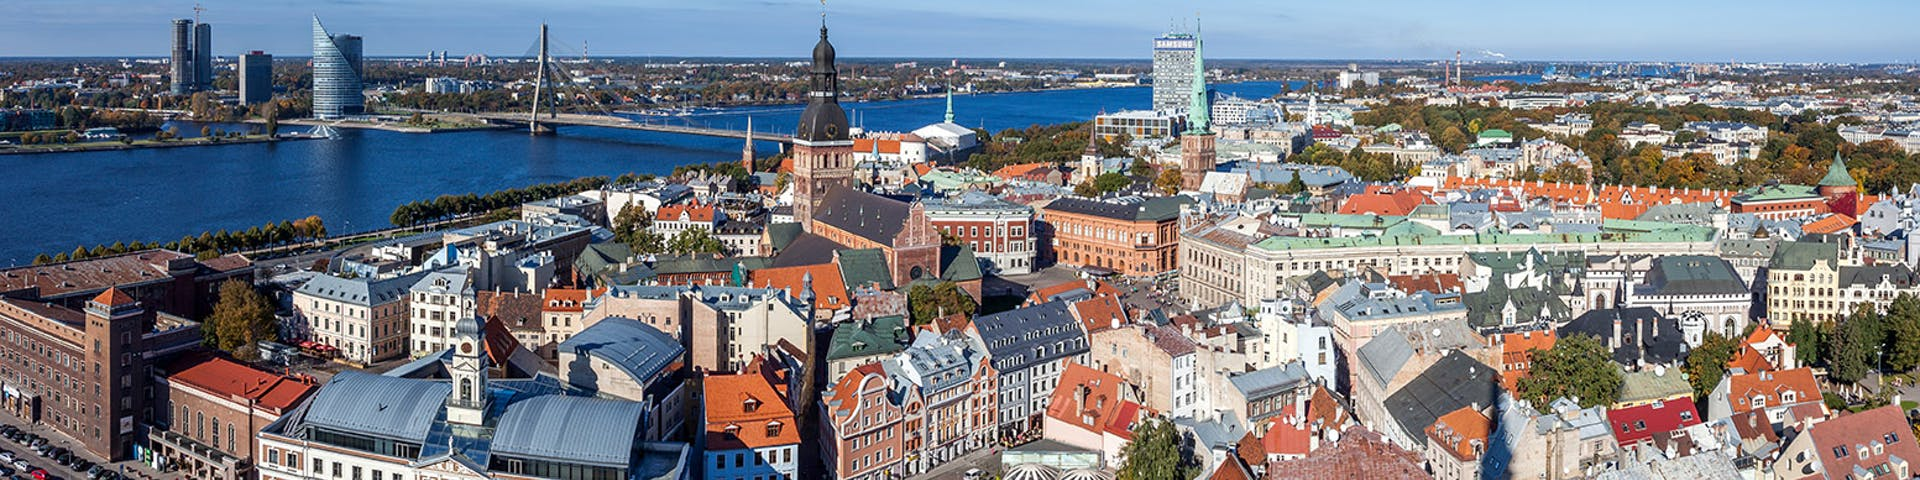 Pakistani Student Visa for Studying Bachelor's in Latvia